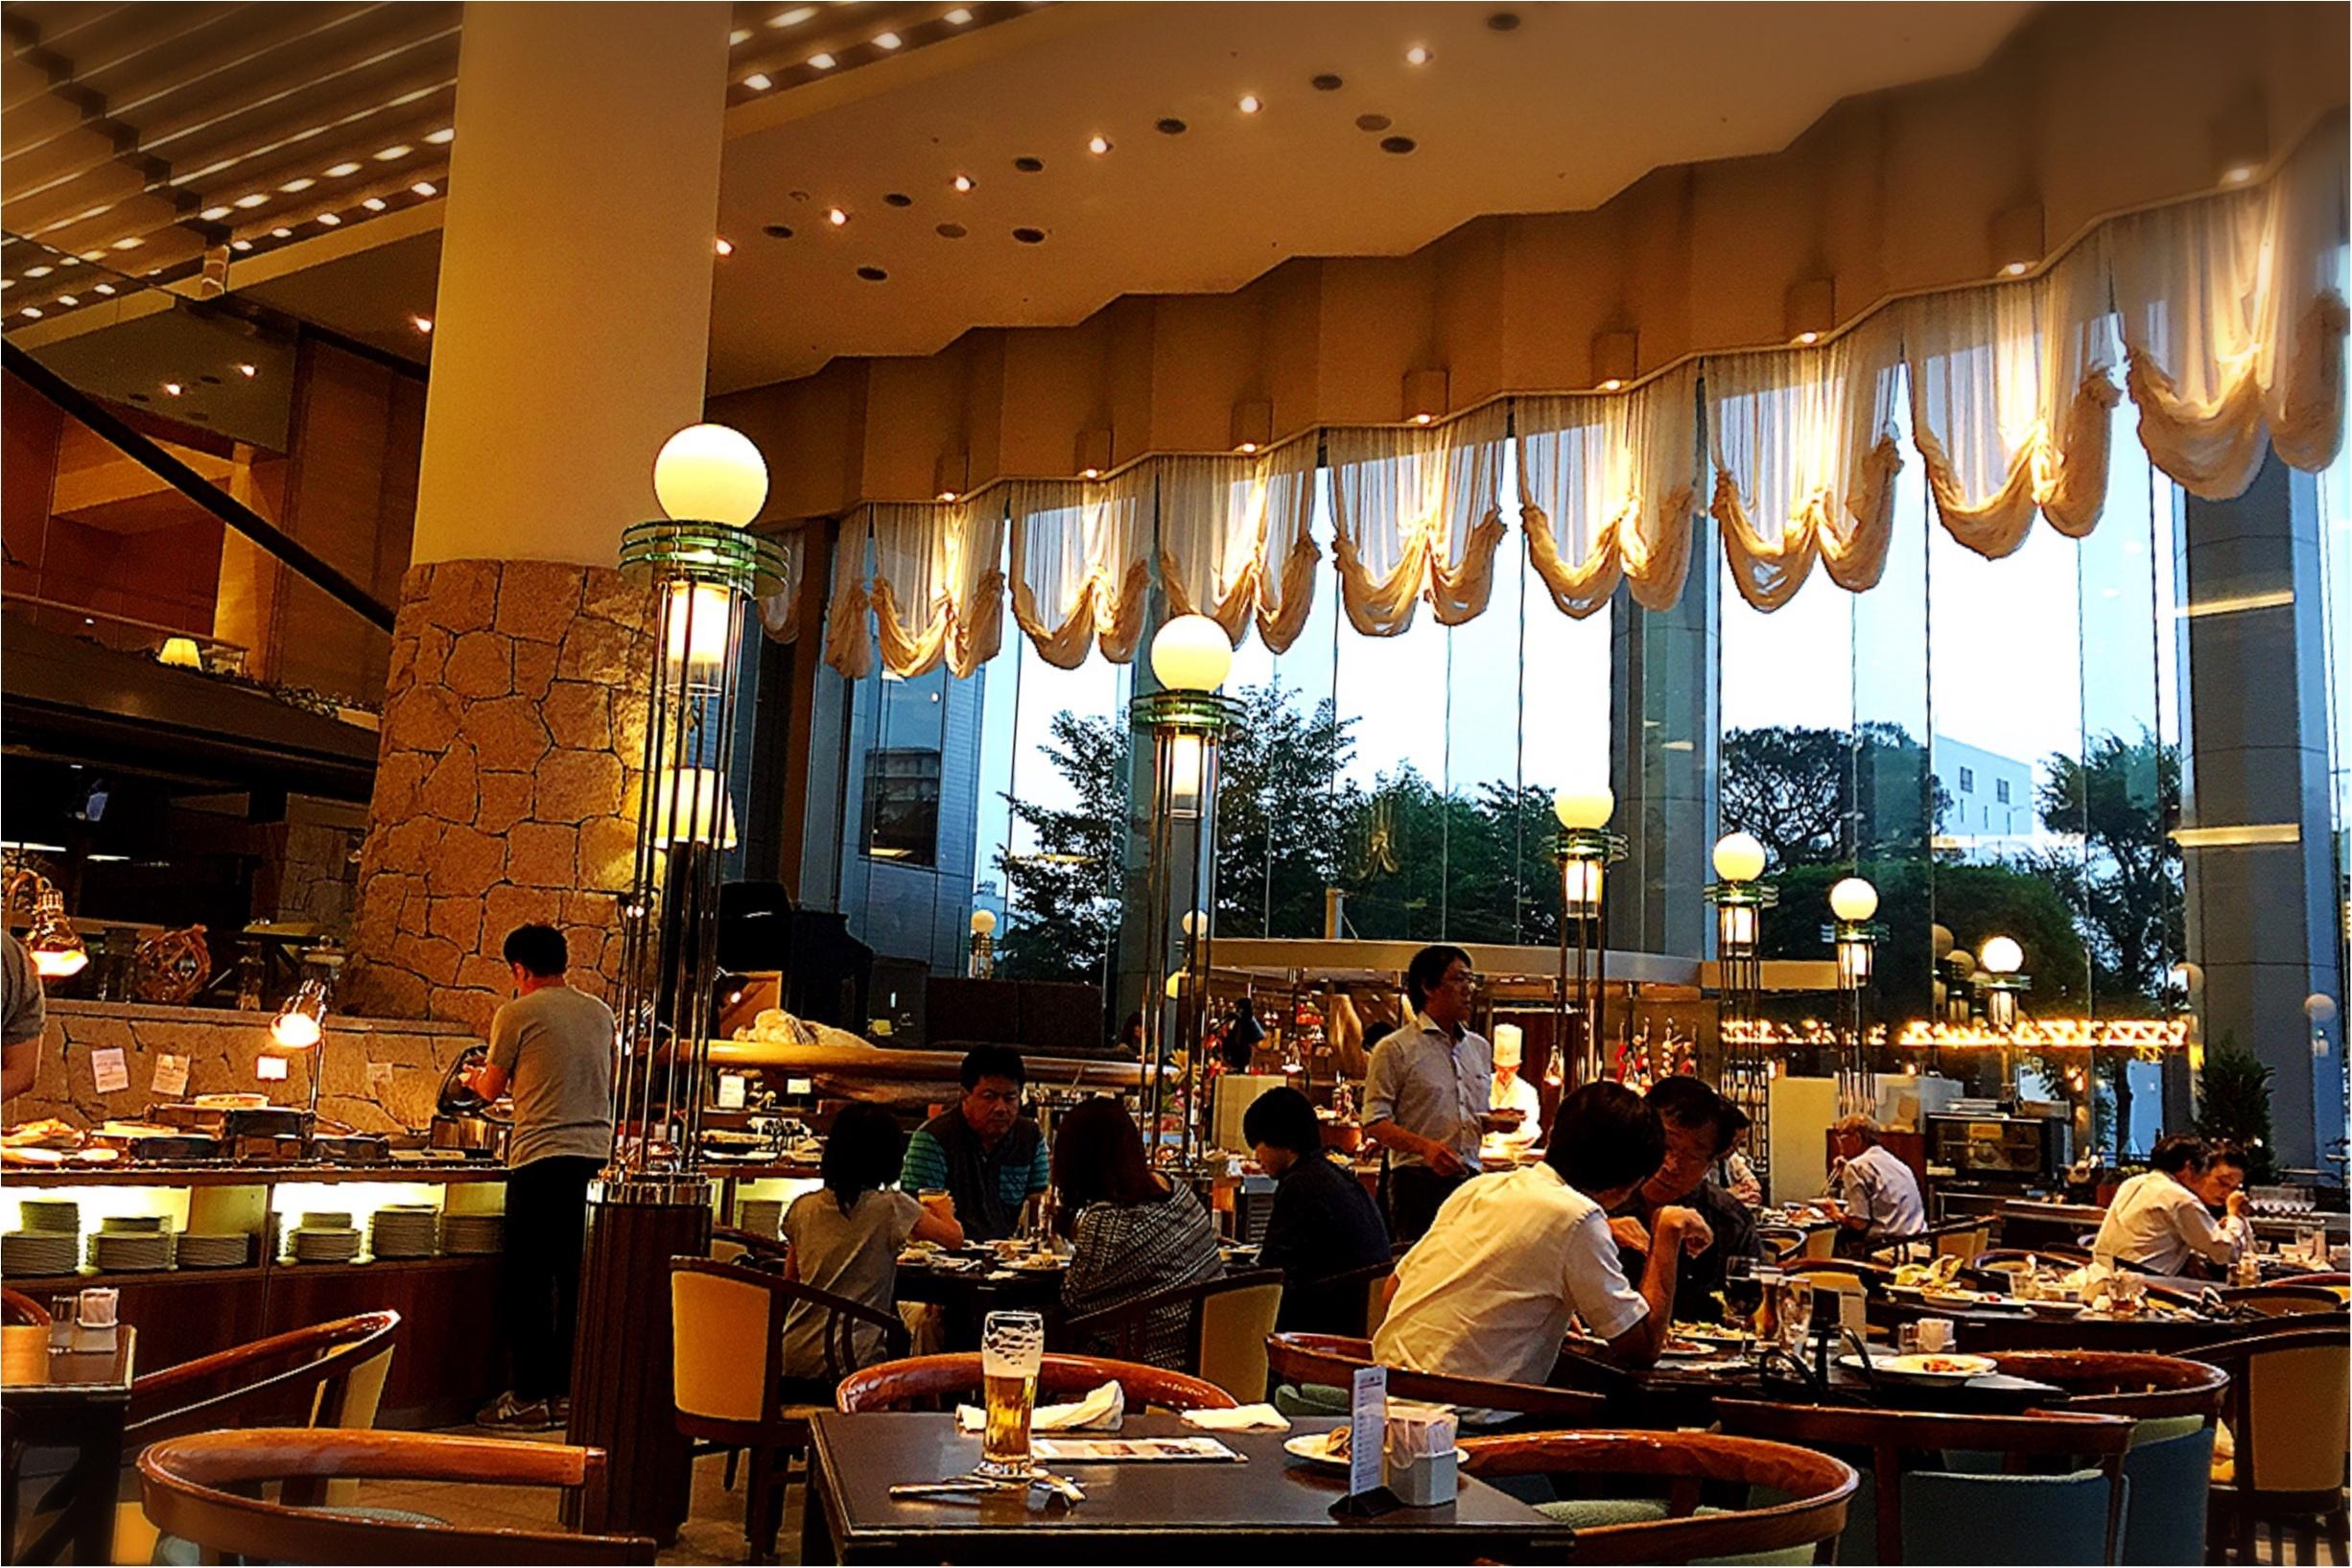 【DINNER】いまお得なディナーはココ!第一ホテル東京シーフォートへ行ってきました☆_3